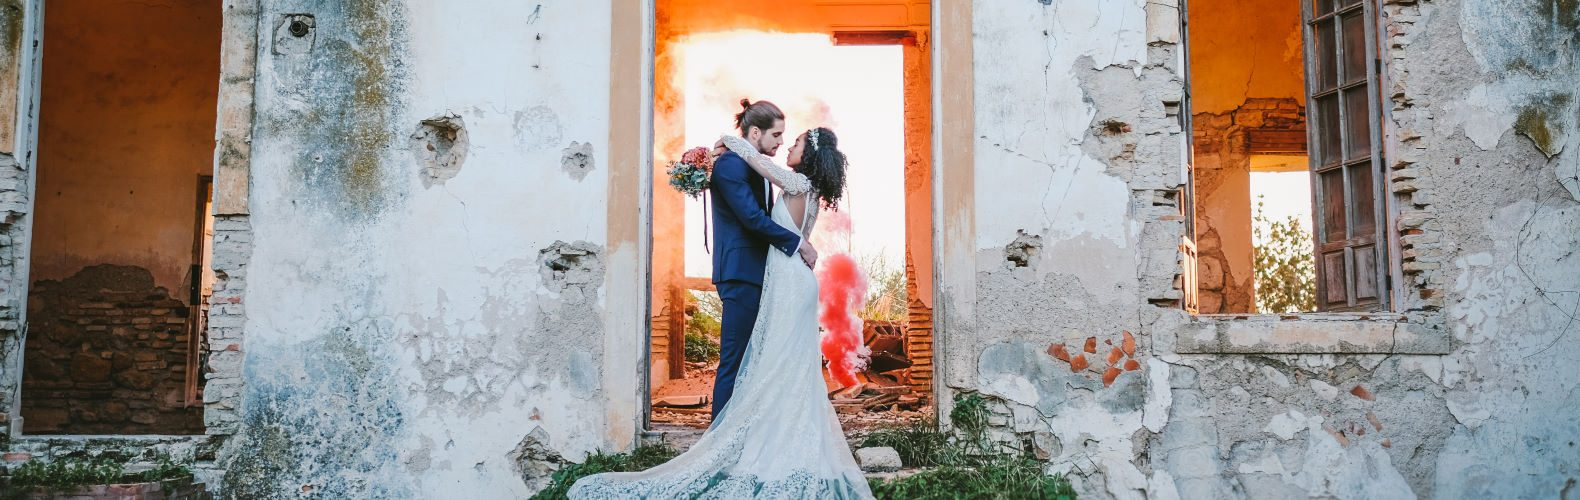 Sweet Studio, fotógrafos de bodas